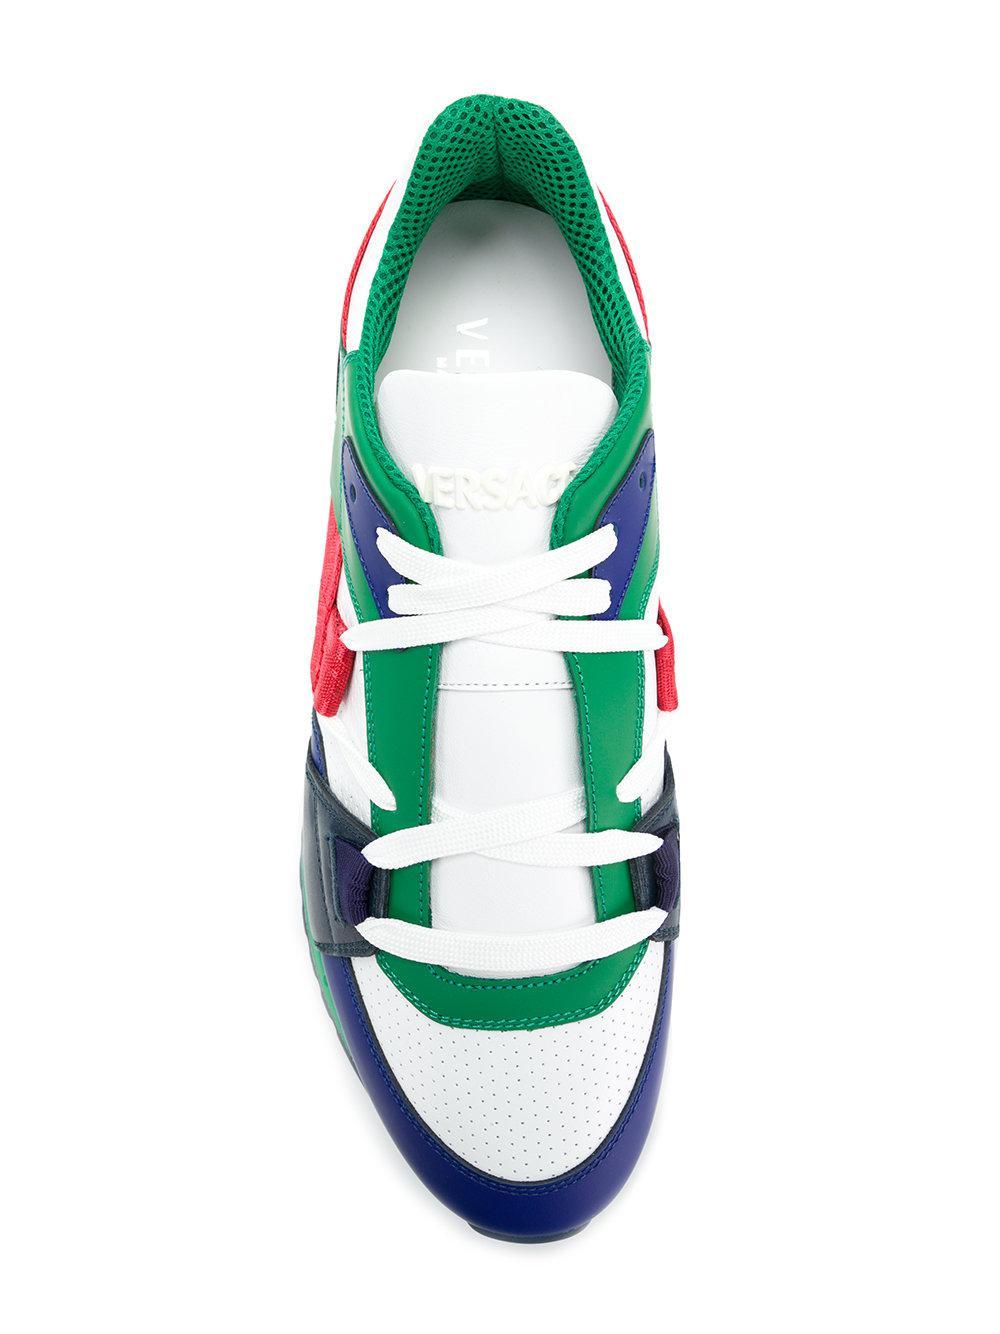 Grecca detail sneakers - Green Versace 1G6crbxU